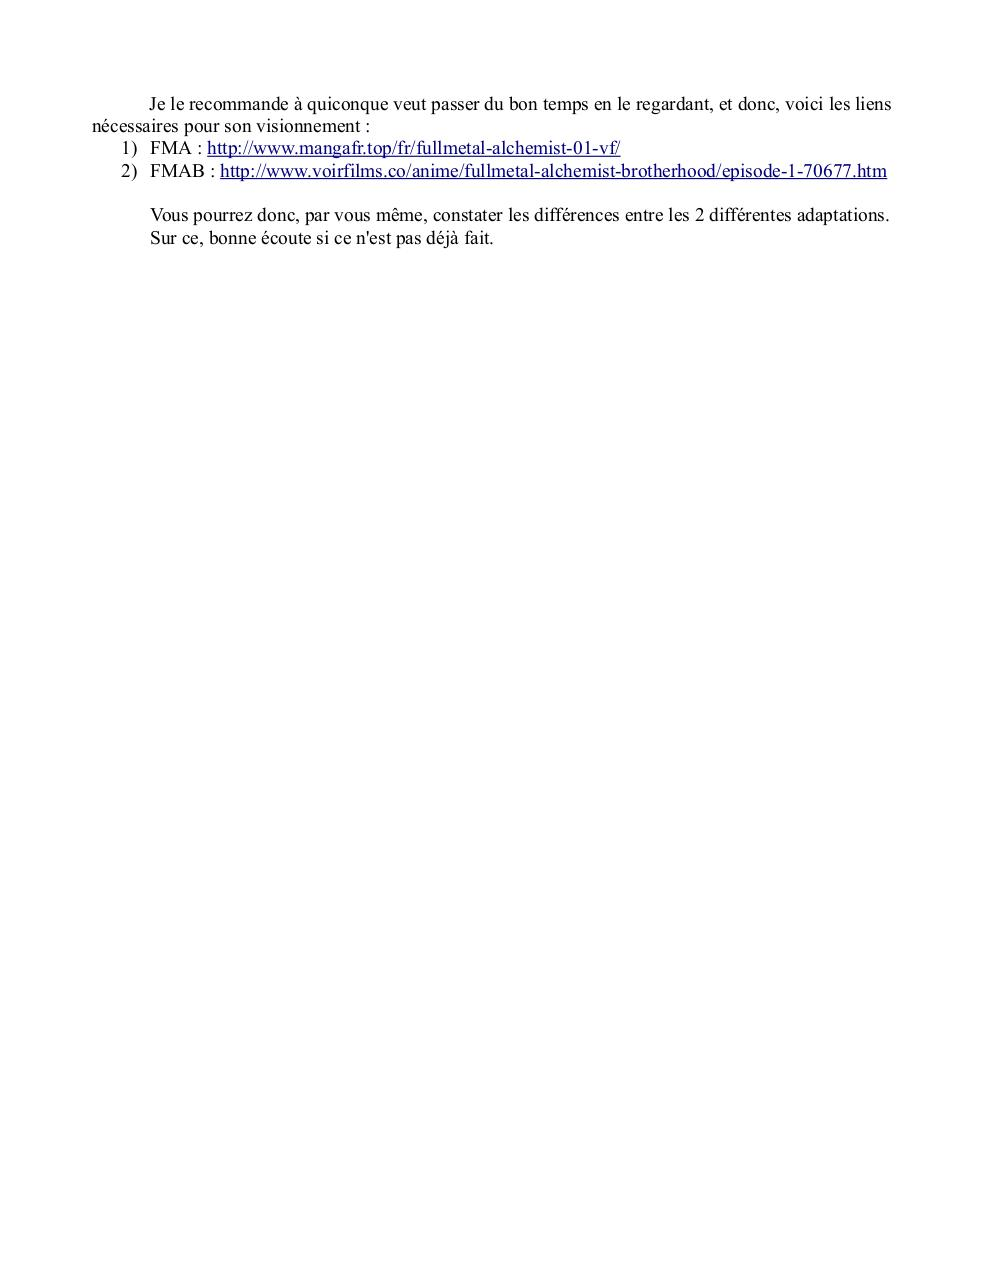 Full Metal Alchemist Pdf Fr fma fmab par joël gobeil - fichier pdf